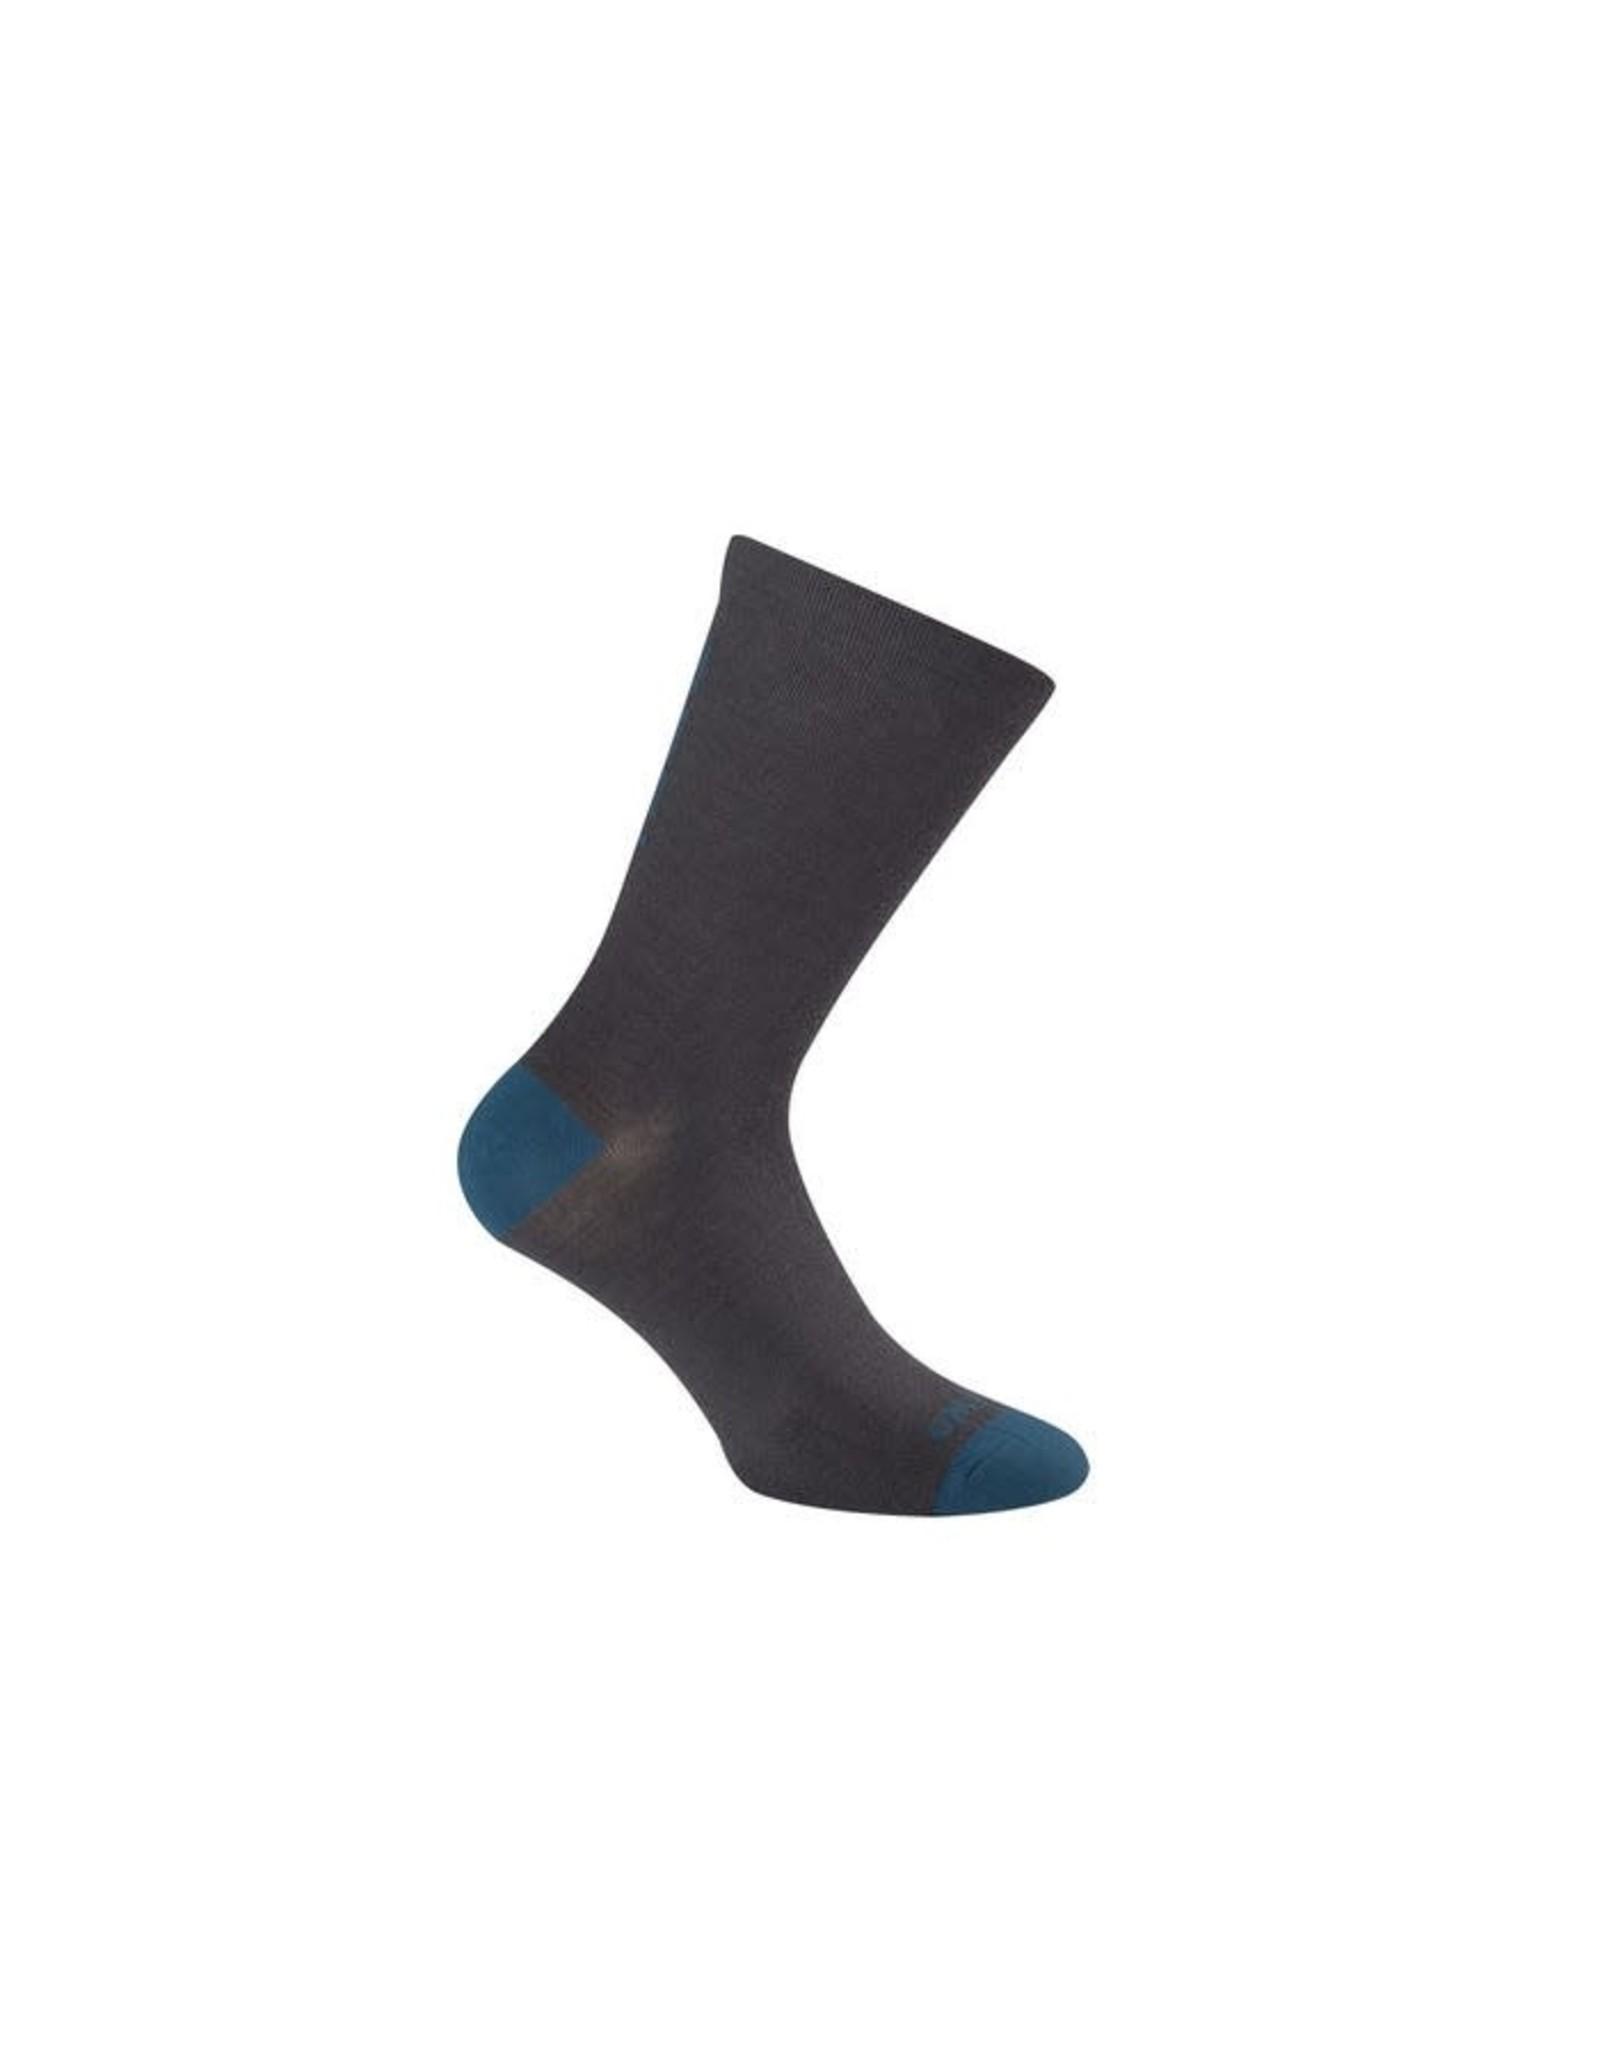 7MESH 7MESH - Ashlu Gull Merino Sock Small